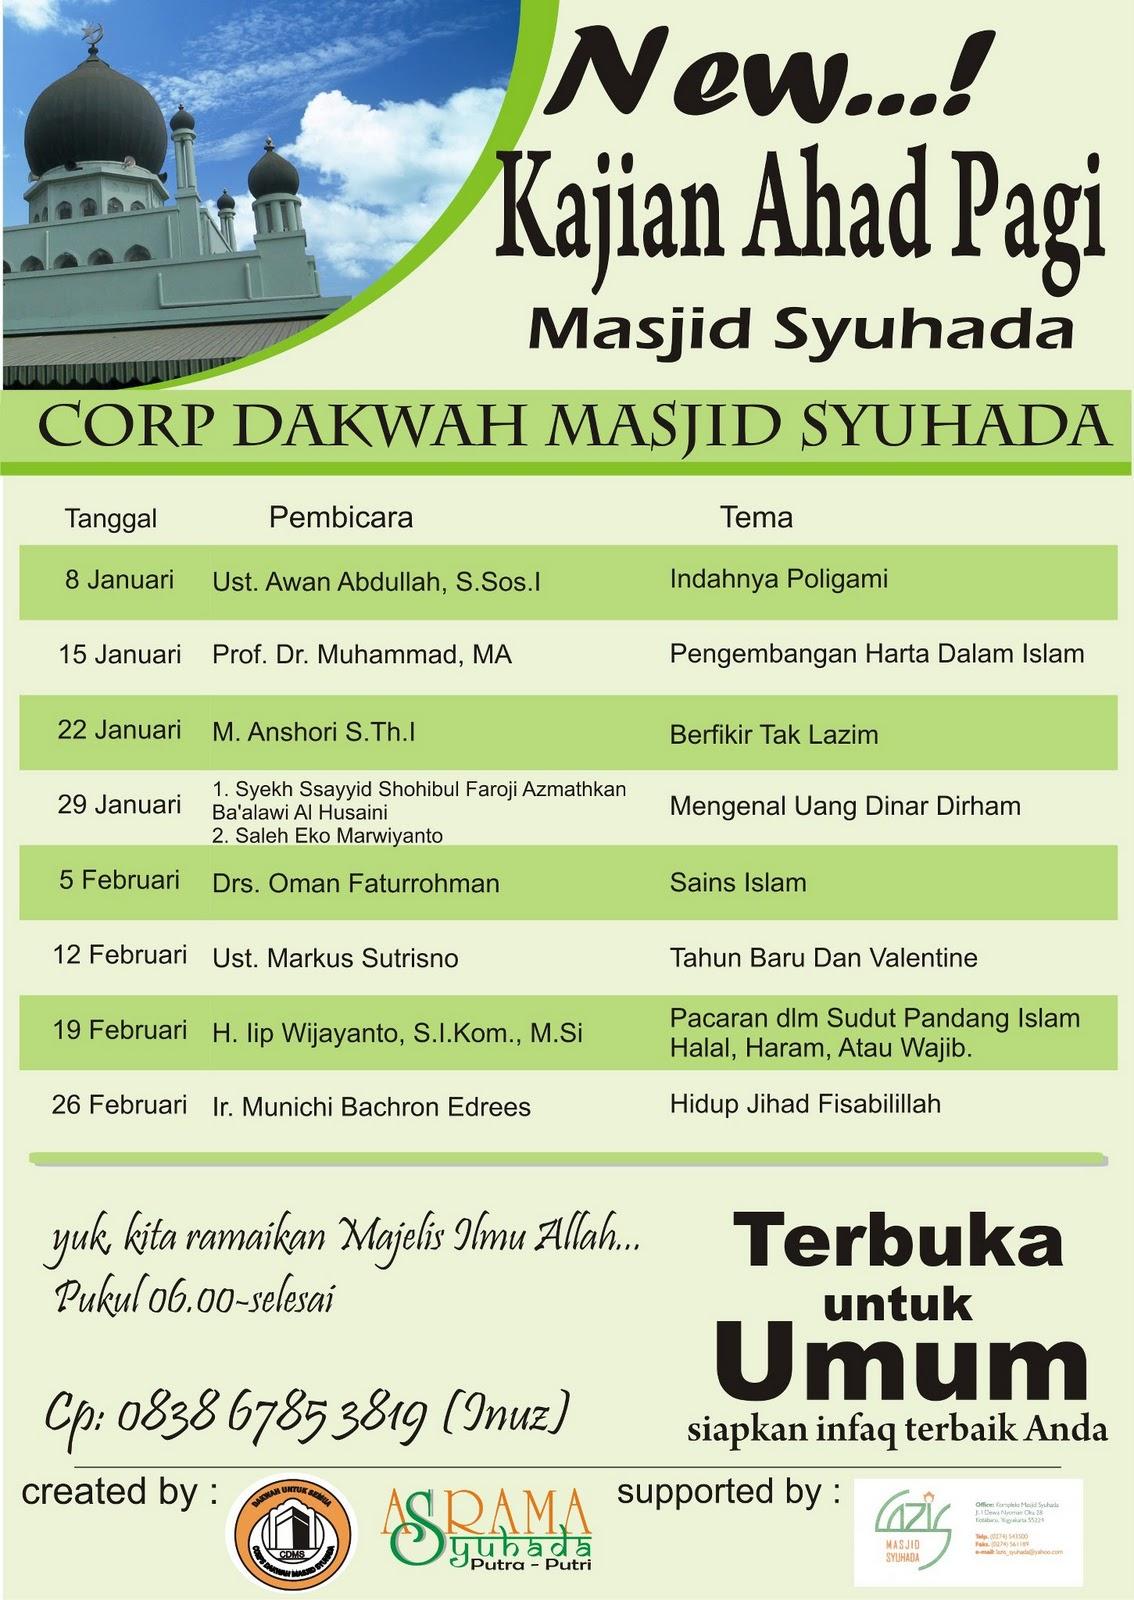 Perdana 2012 Kajian Ahad Pagi Masjid Syuhada Bulletin Kota Yogyakarta